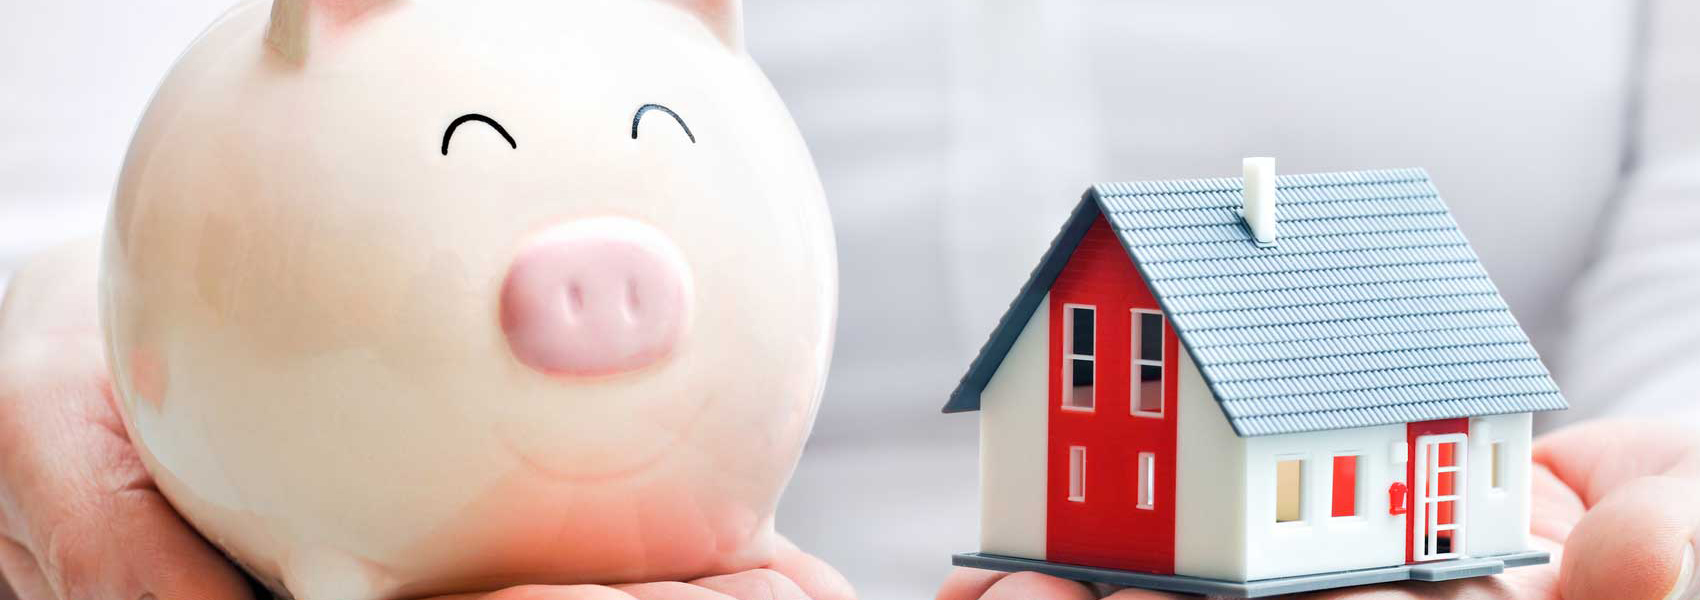 Vancouver Canada Accountant Joanne YH Liu Seminar on Zoom, Personal Income Tax Preparation